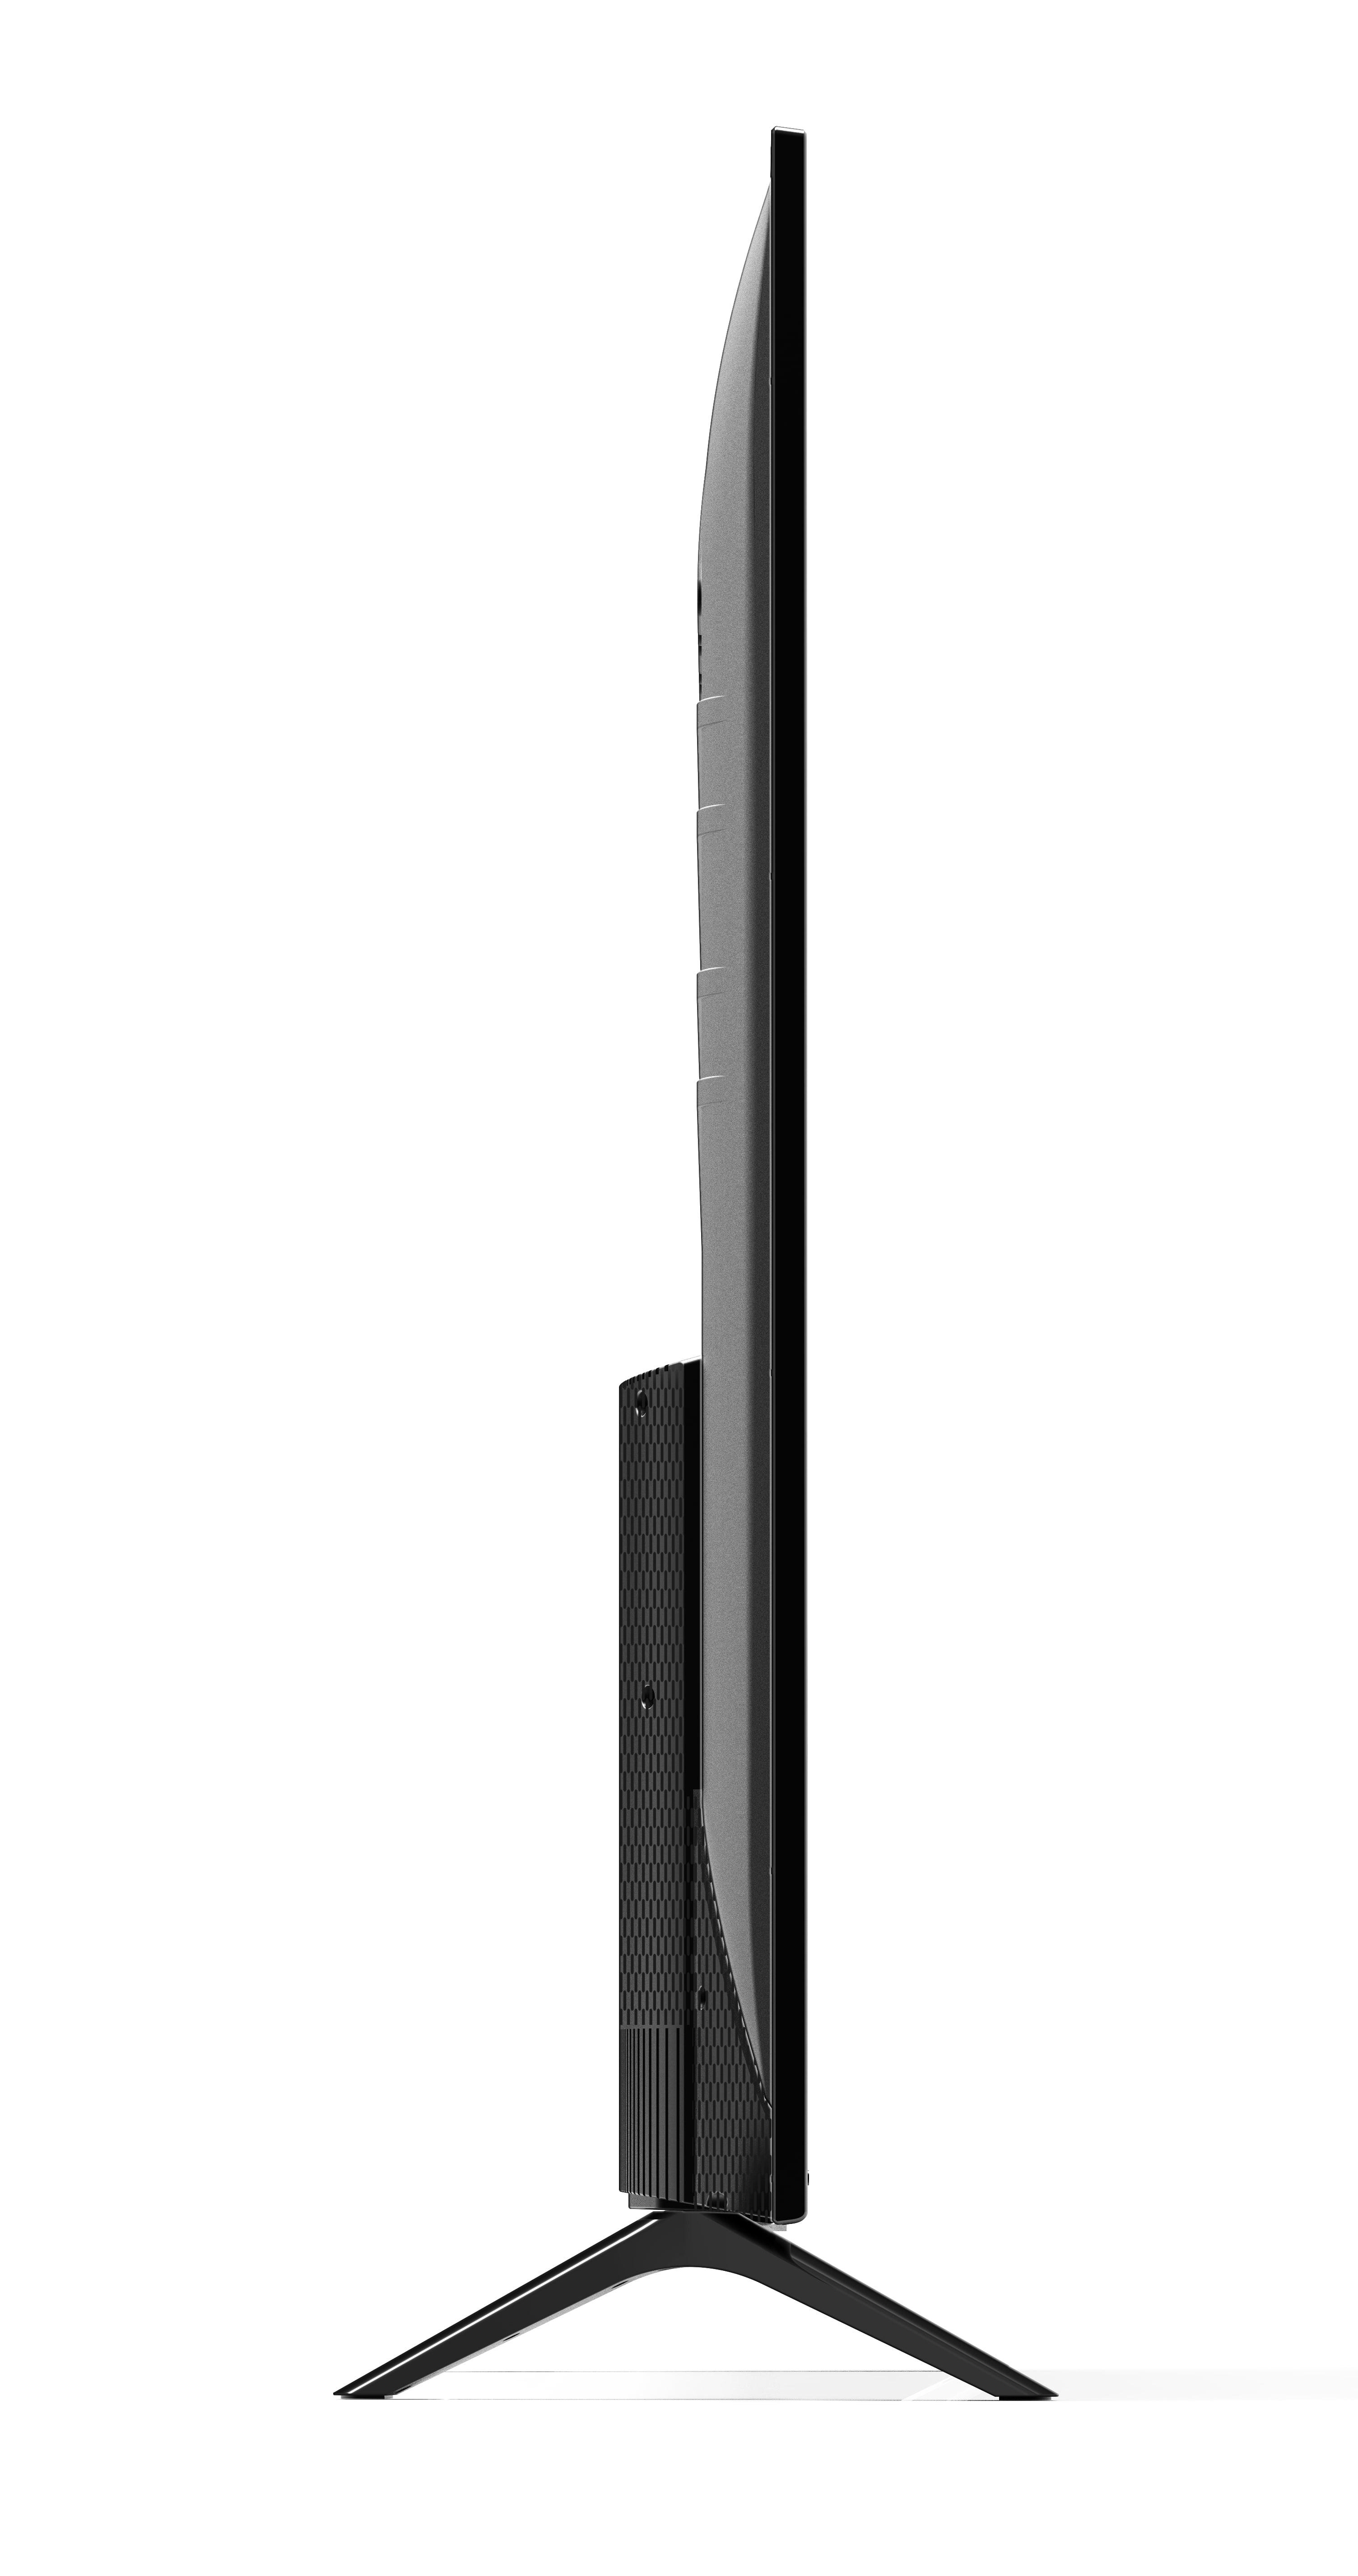 Tcl 65 Class 4k 2160p Hdr Roku Smart Led Tv 65s4 Walmart Com Walmart Com